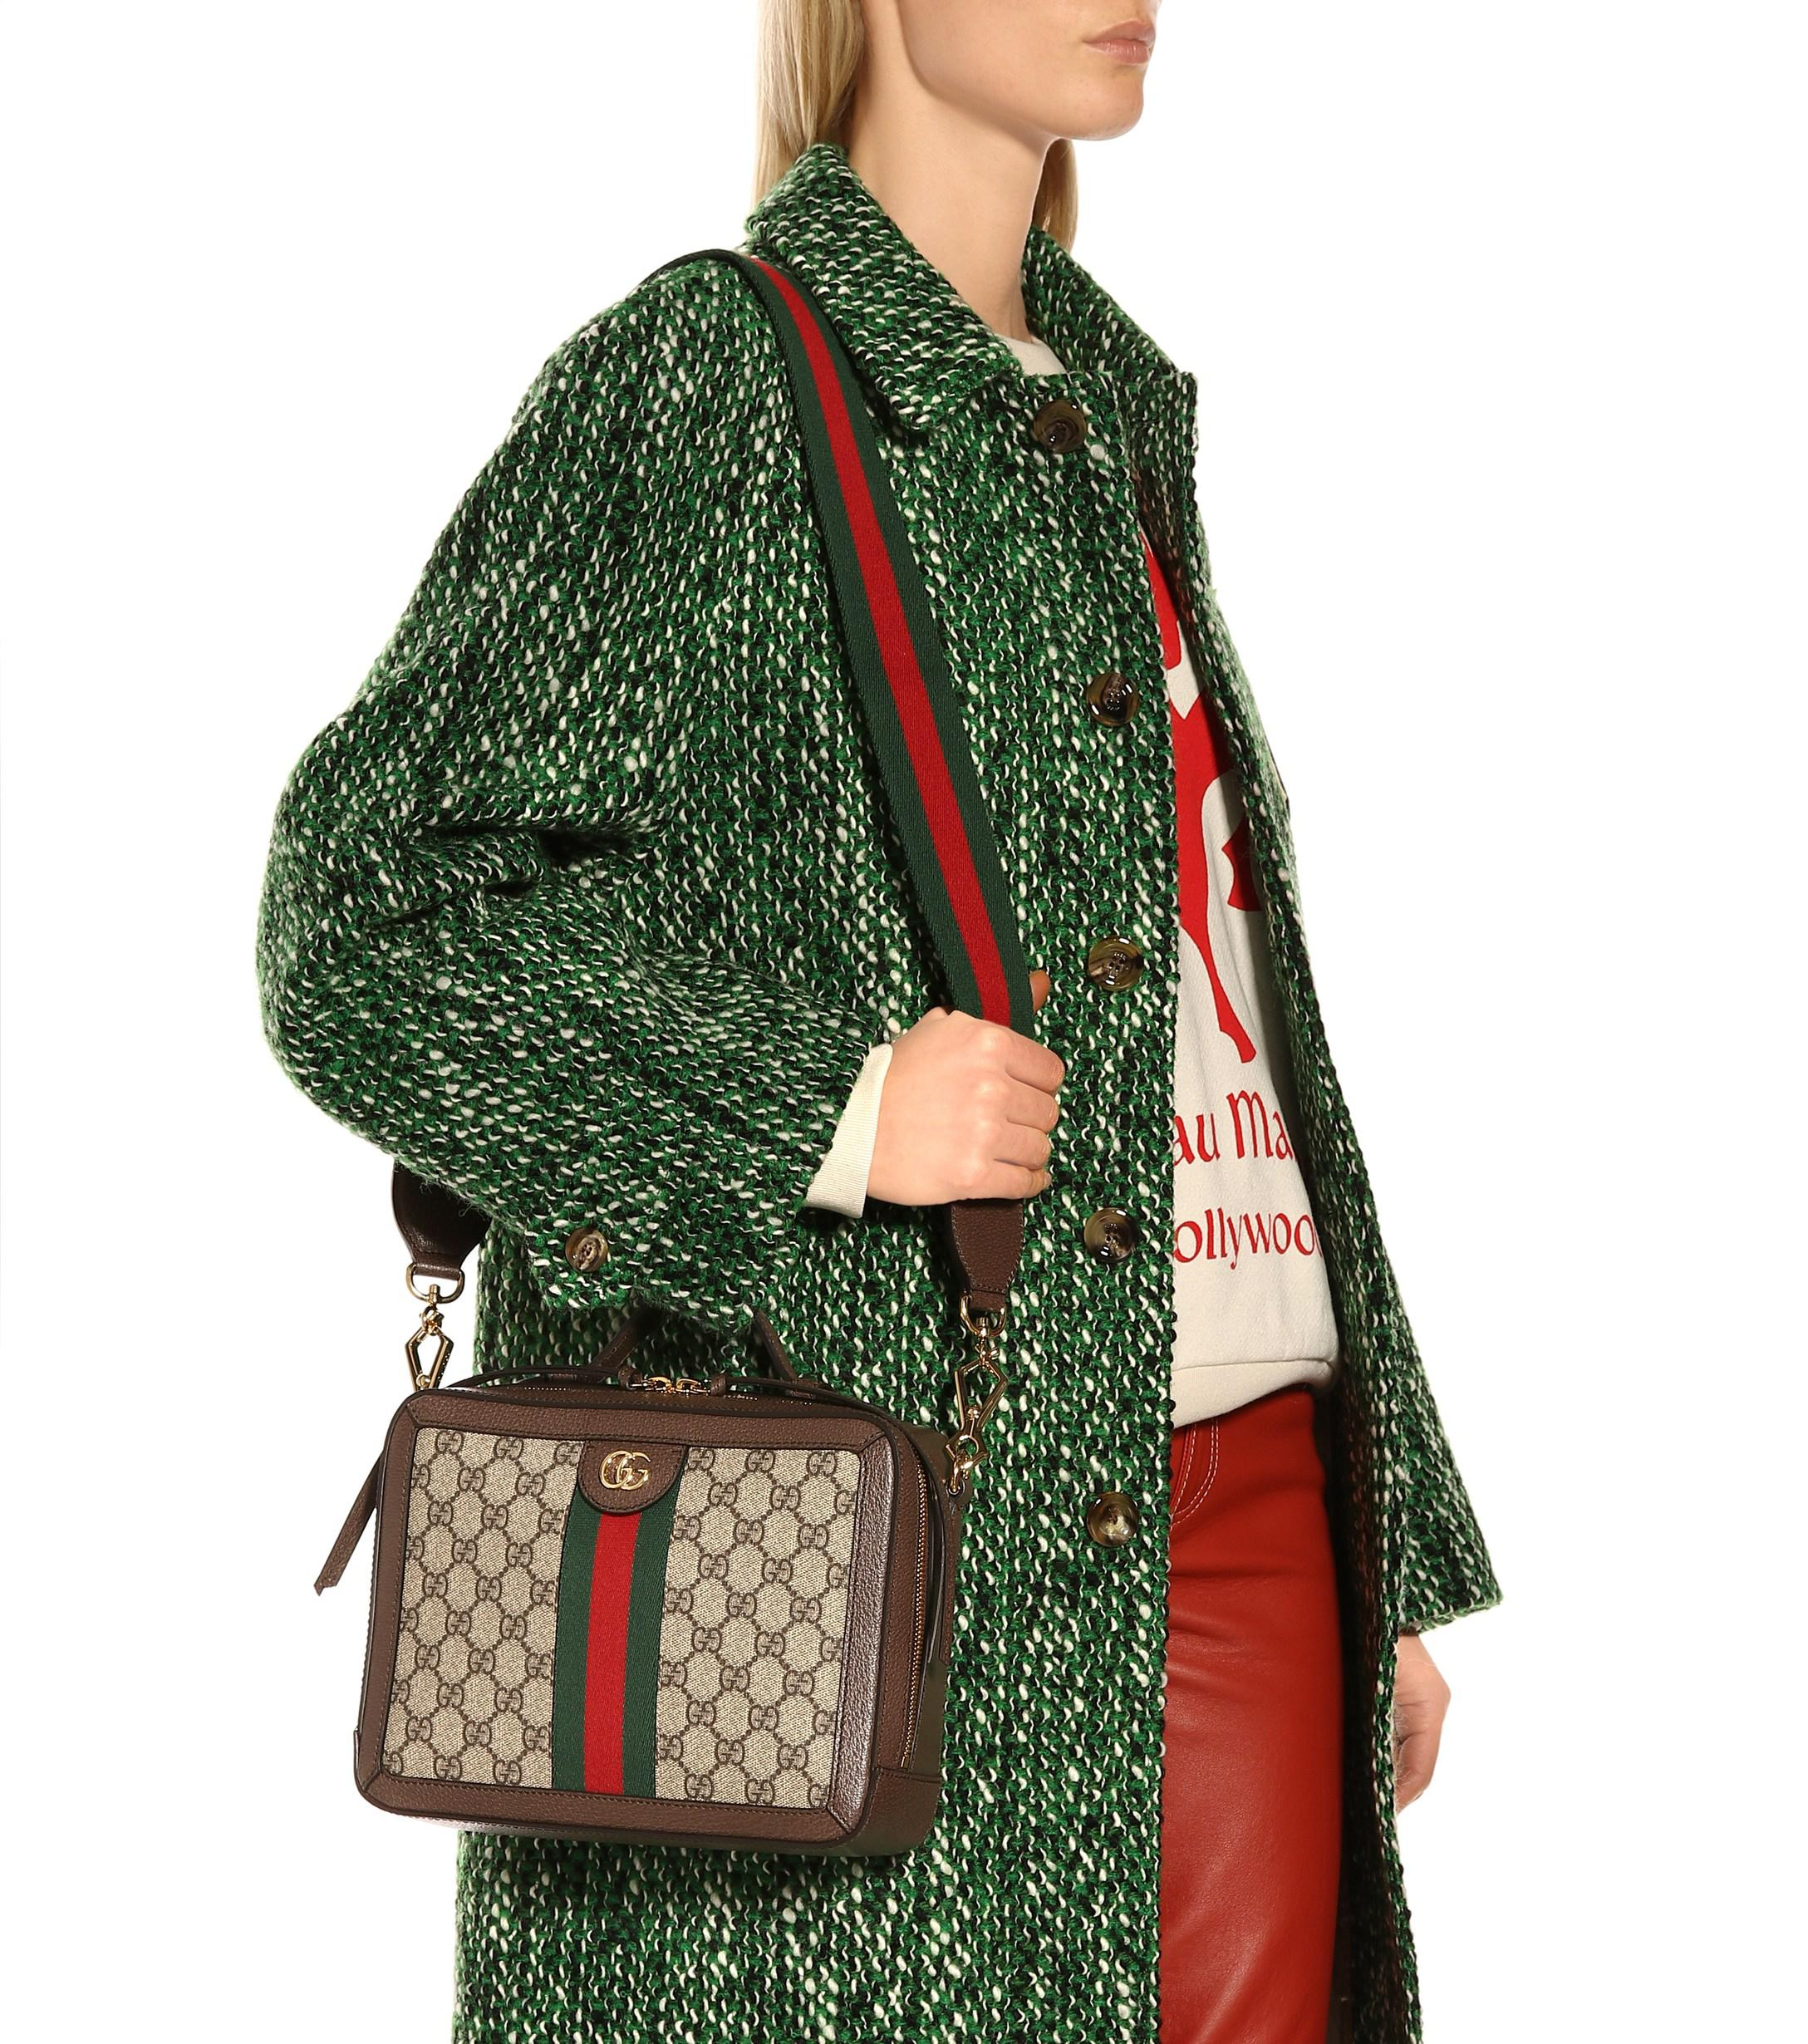 bc5fac5767 Gucci - Multicolor Ophidia Small GG Supreme Shoulder Bag - Lyst. View  fullscreen